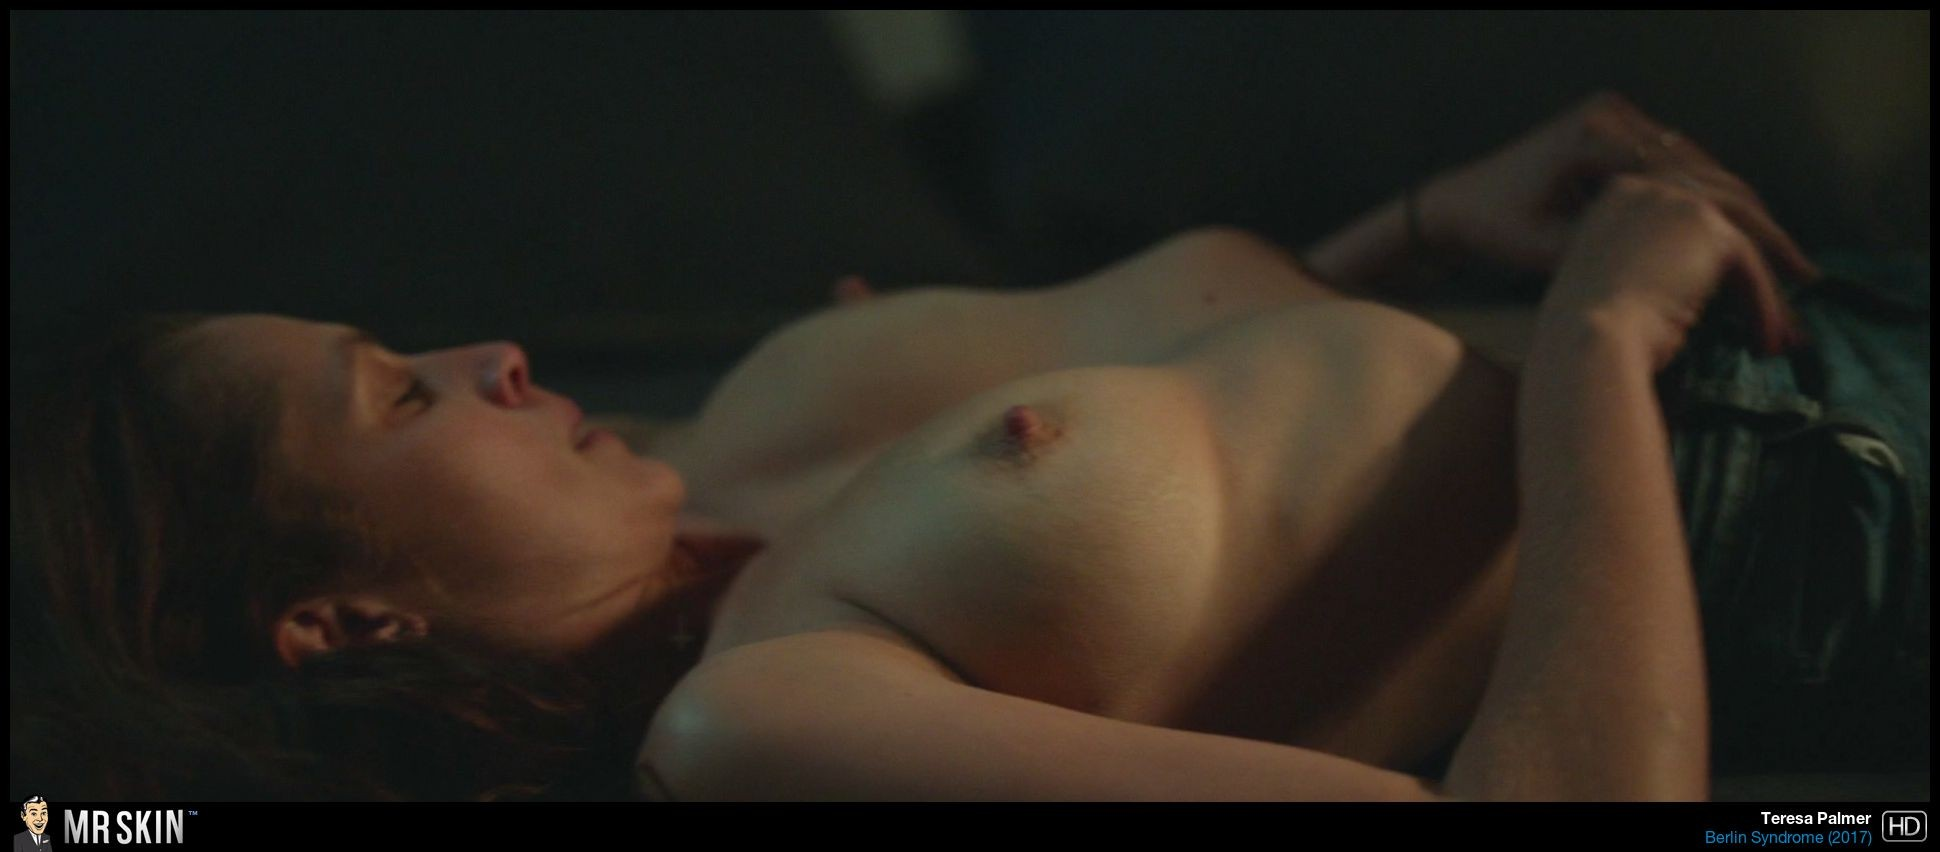 teresa palmer naked sex videos